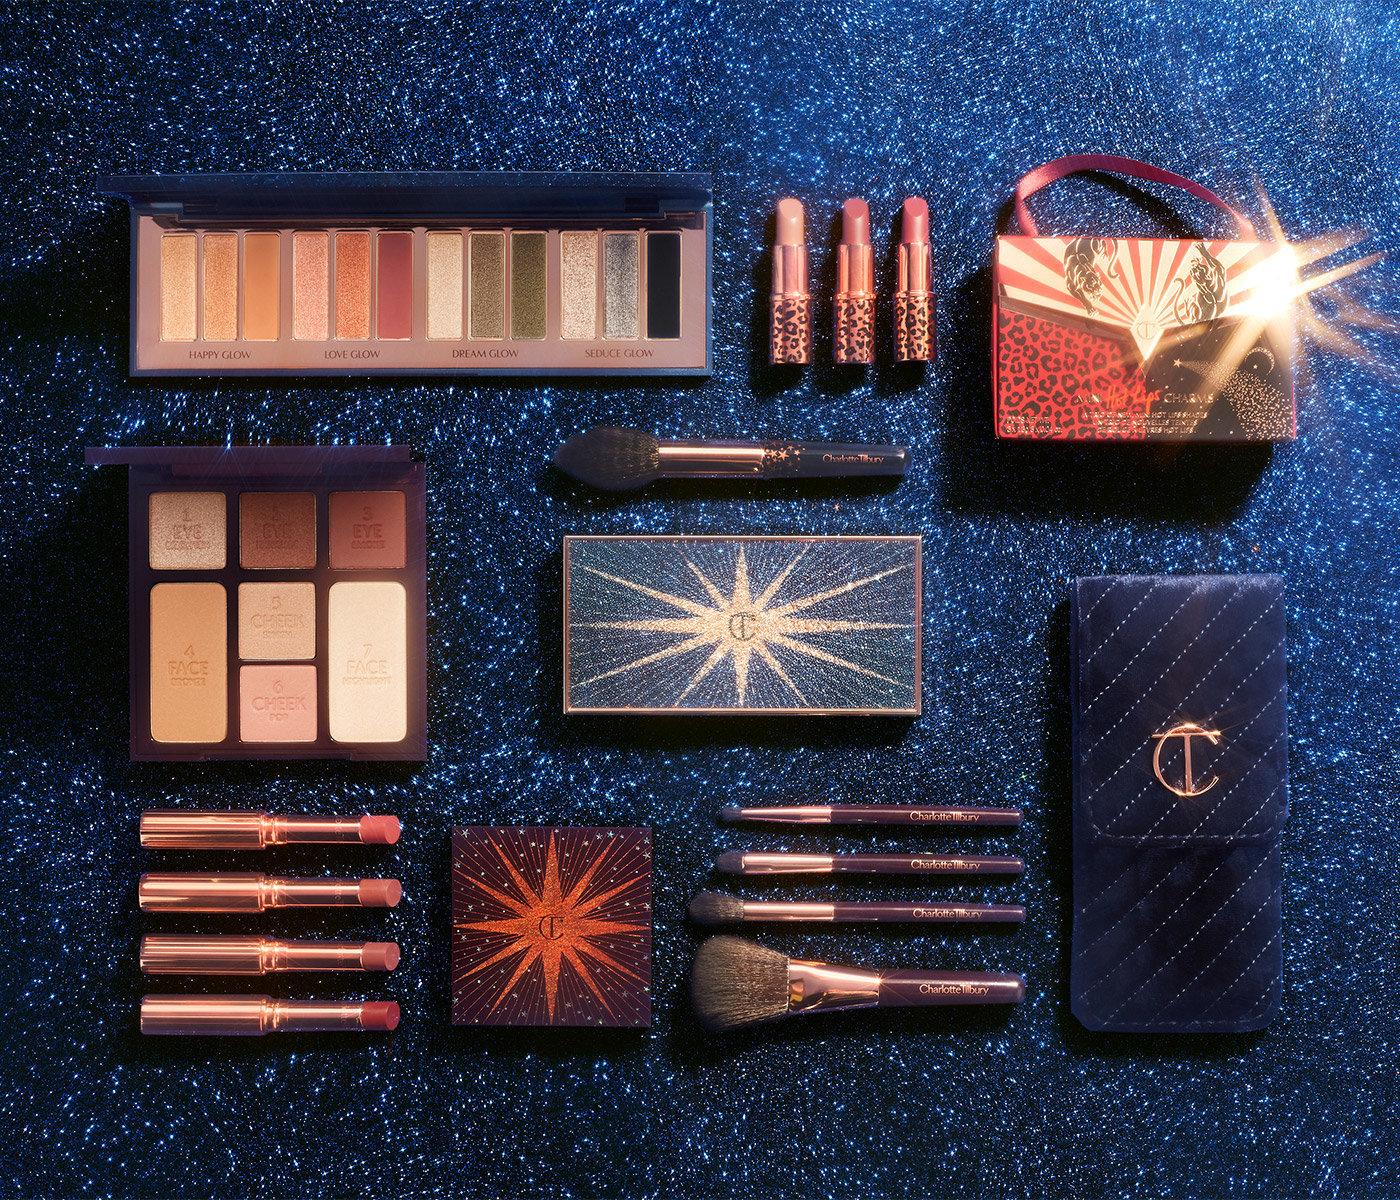 Shop the Charlotte Tilbury Holiday Collection on Beautylish